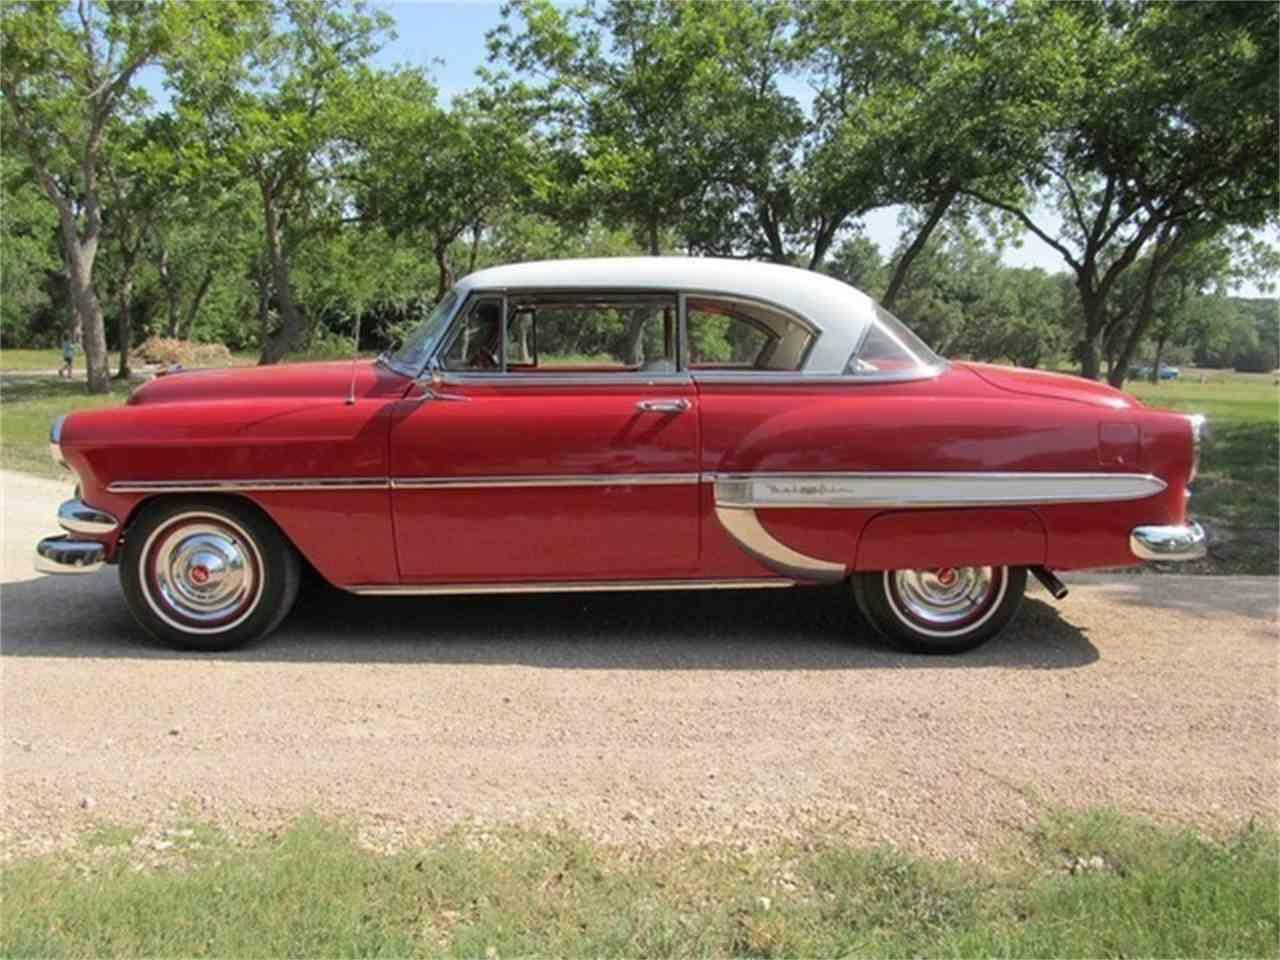 All Chevy 1954 chevrolet belair : 1954 Chevrolet Bel Air for Sale | ClassicCars.com | CC-691064